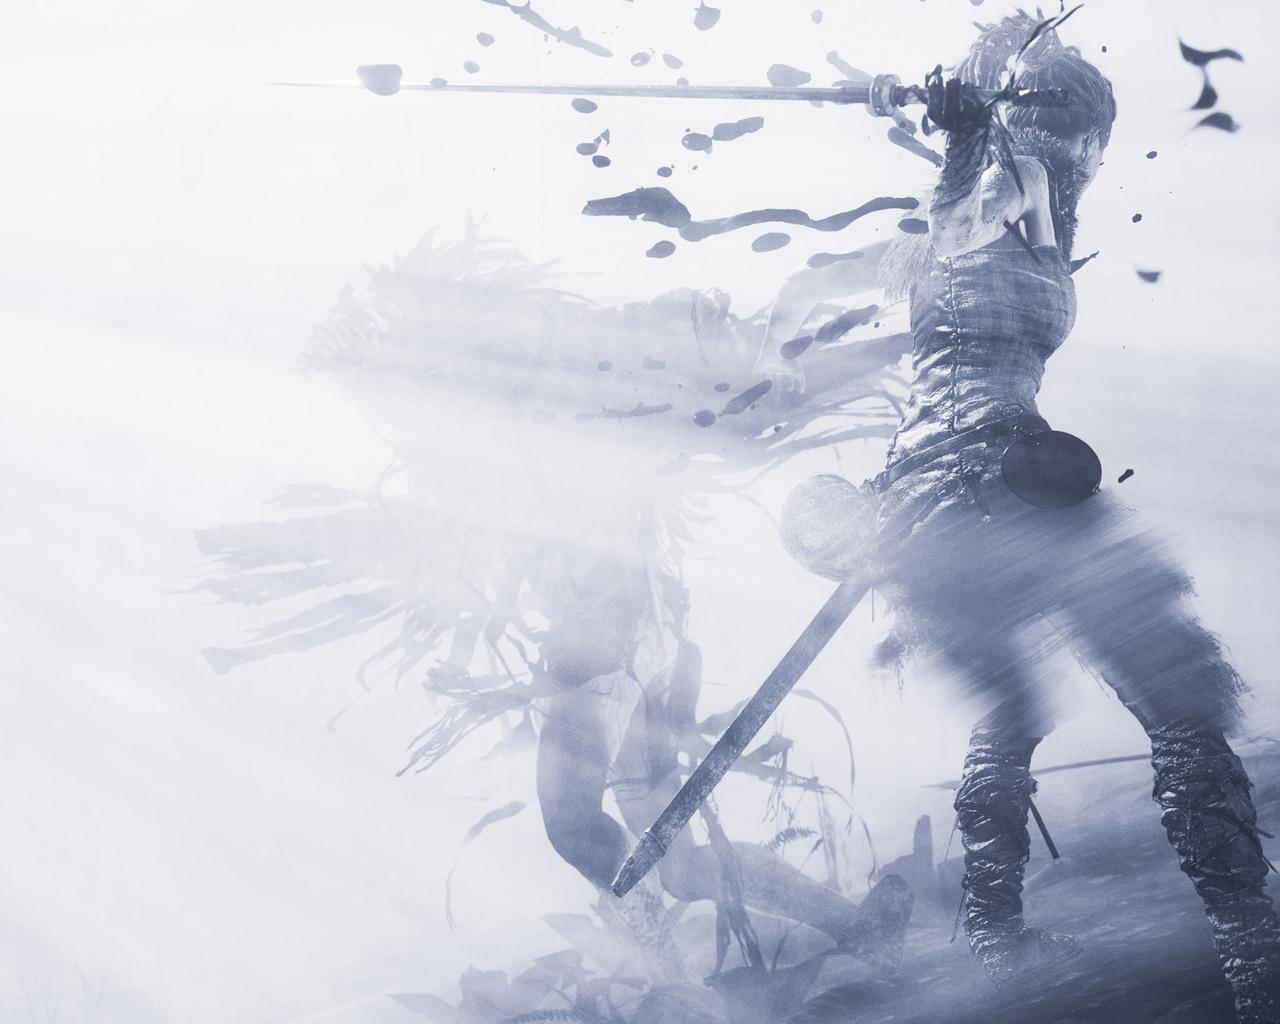 1280x1024 hellblade senuas sacrifice 8k video game 1280x1024